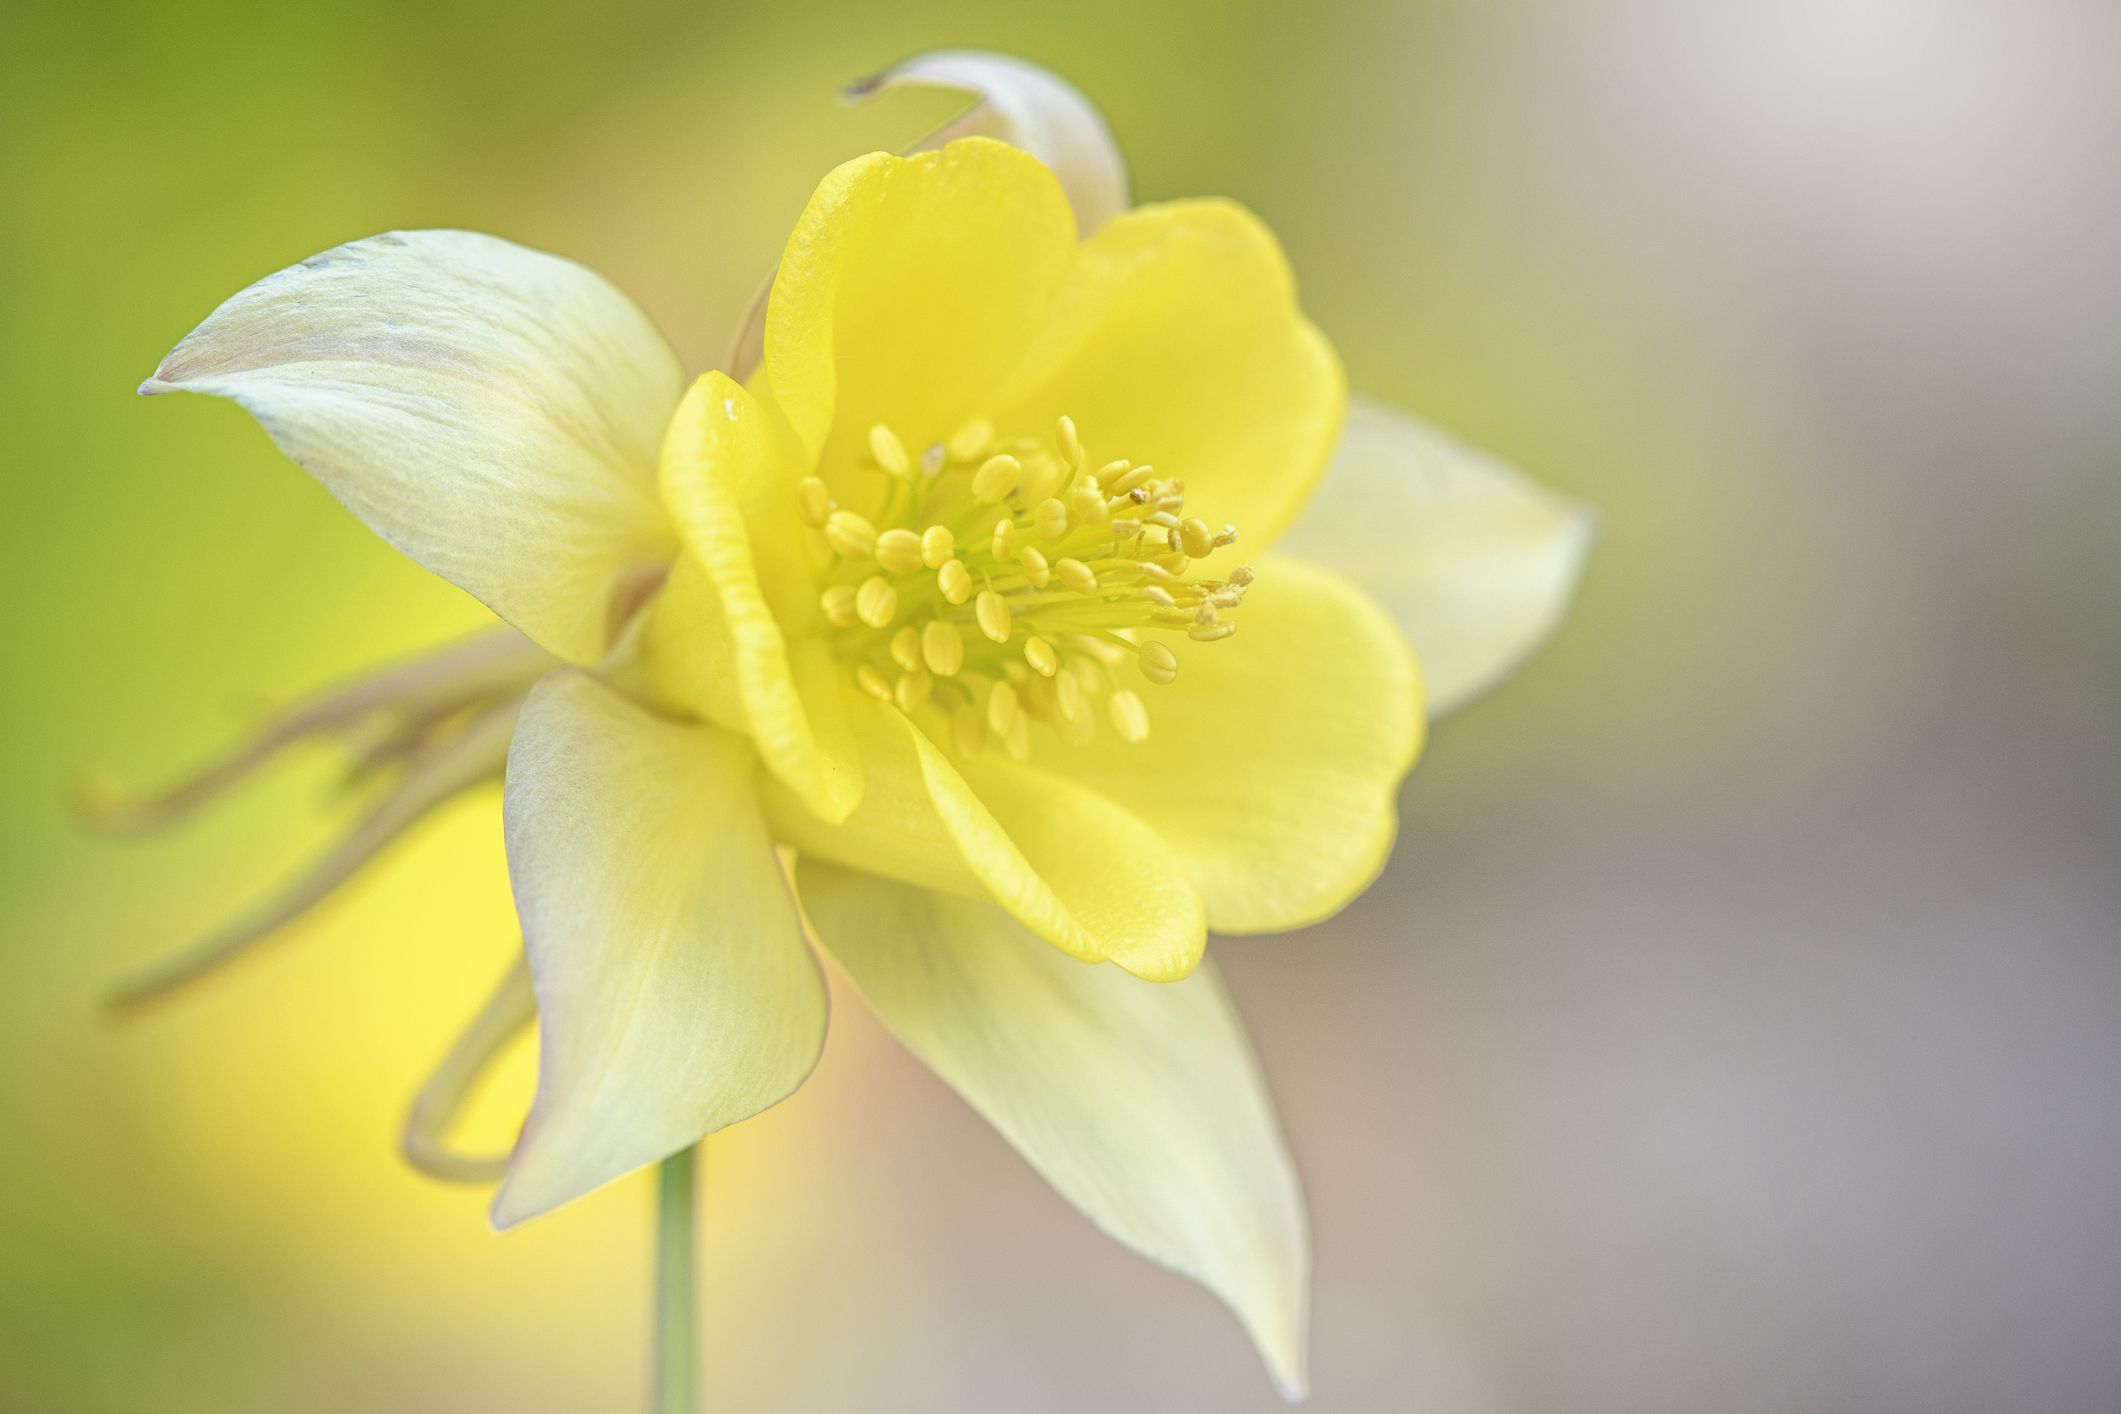 yellow columbine or Granny's Bonnet